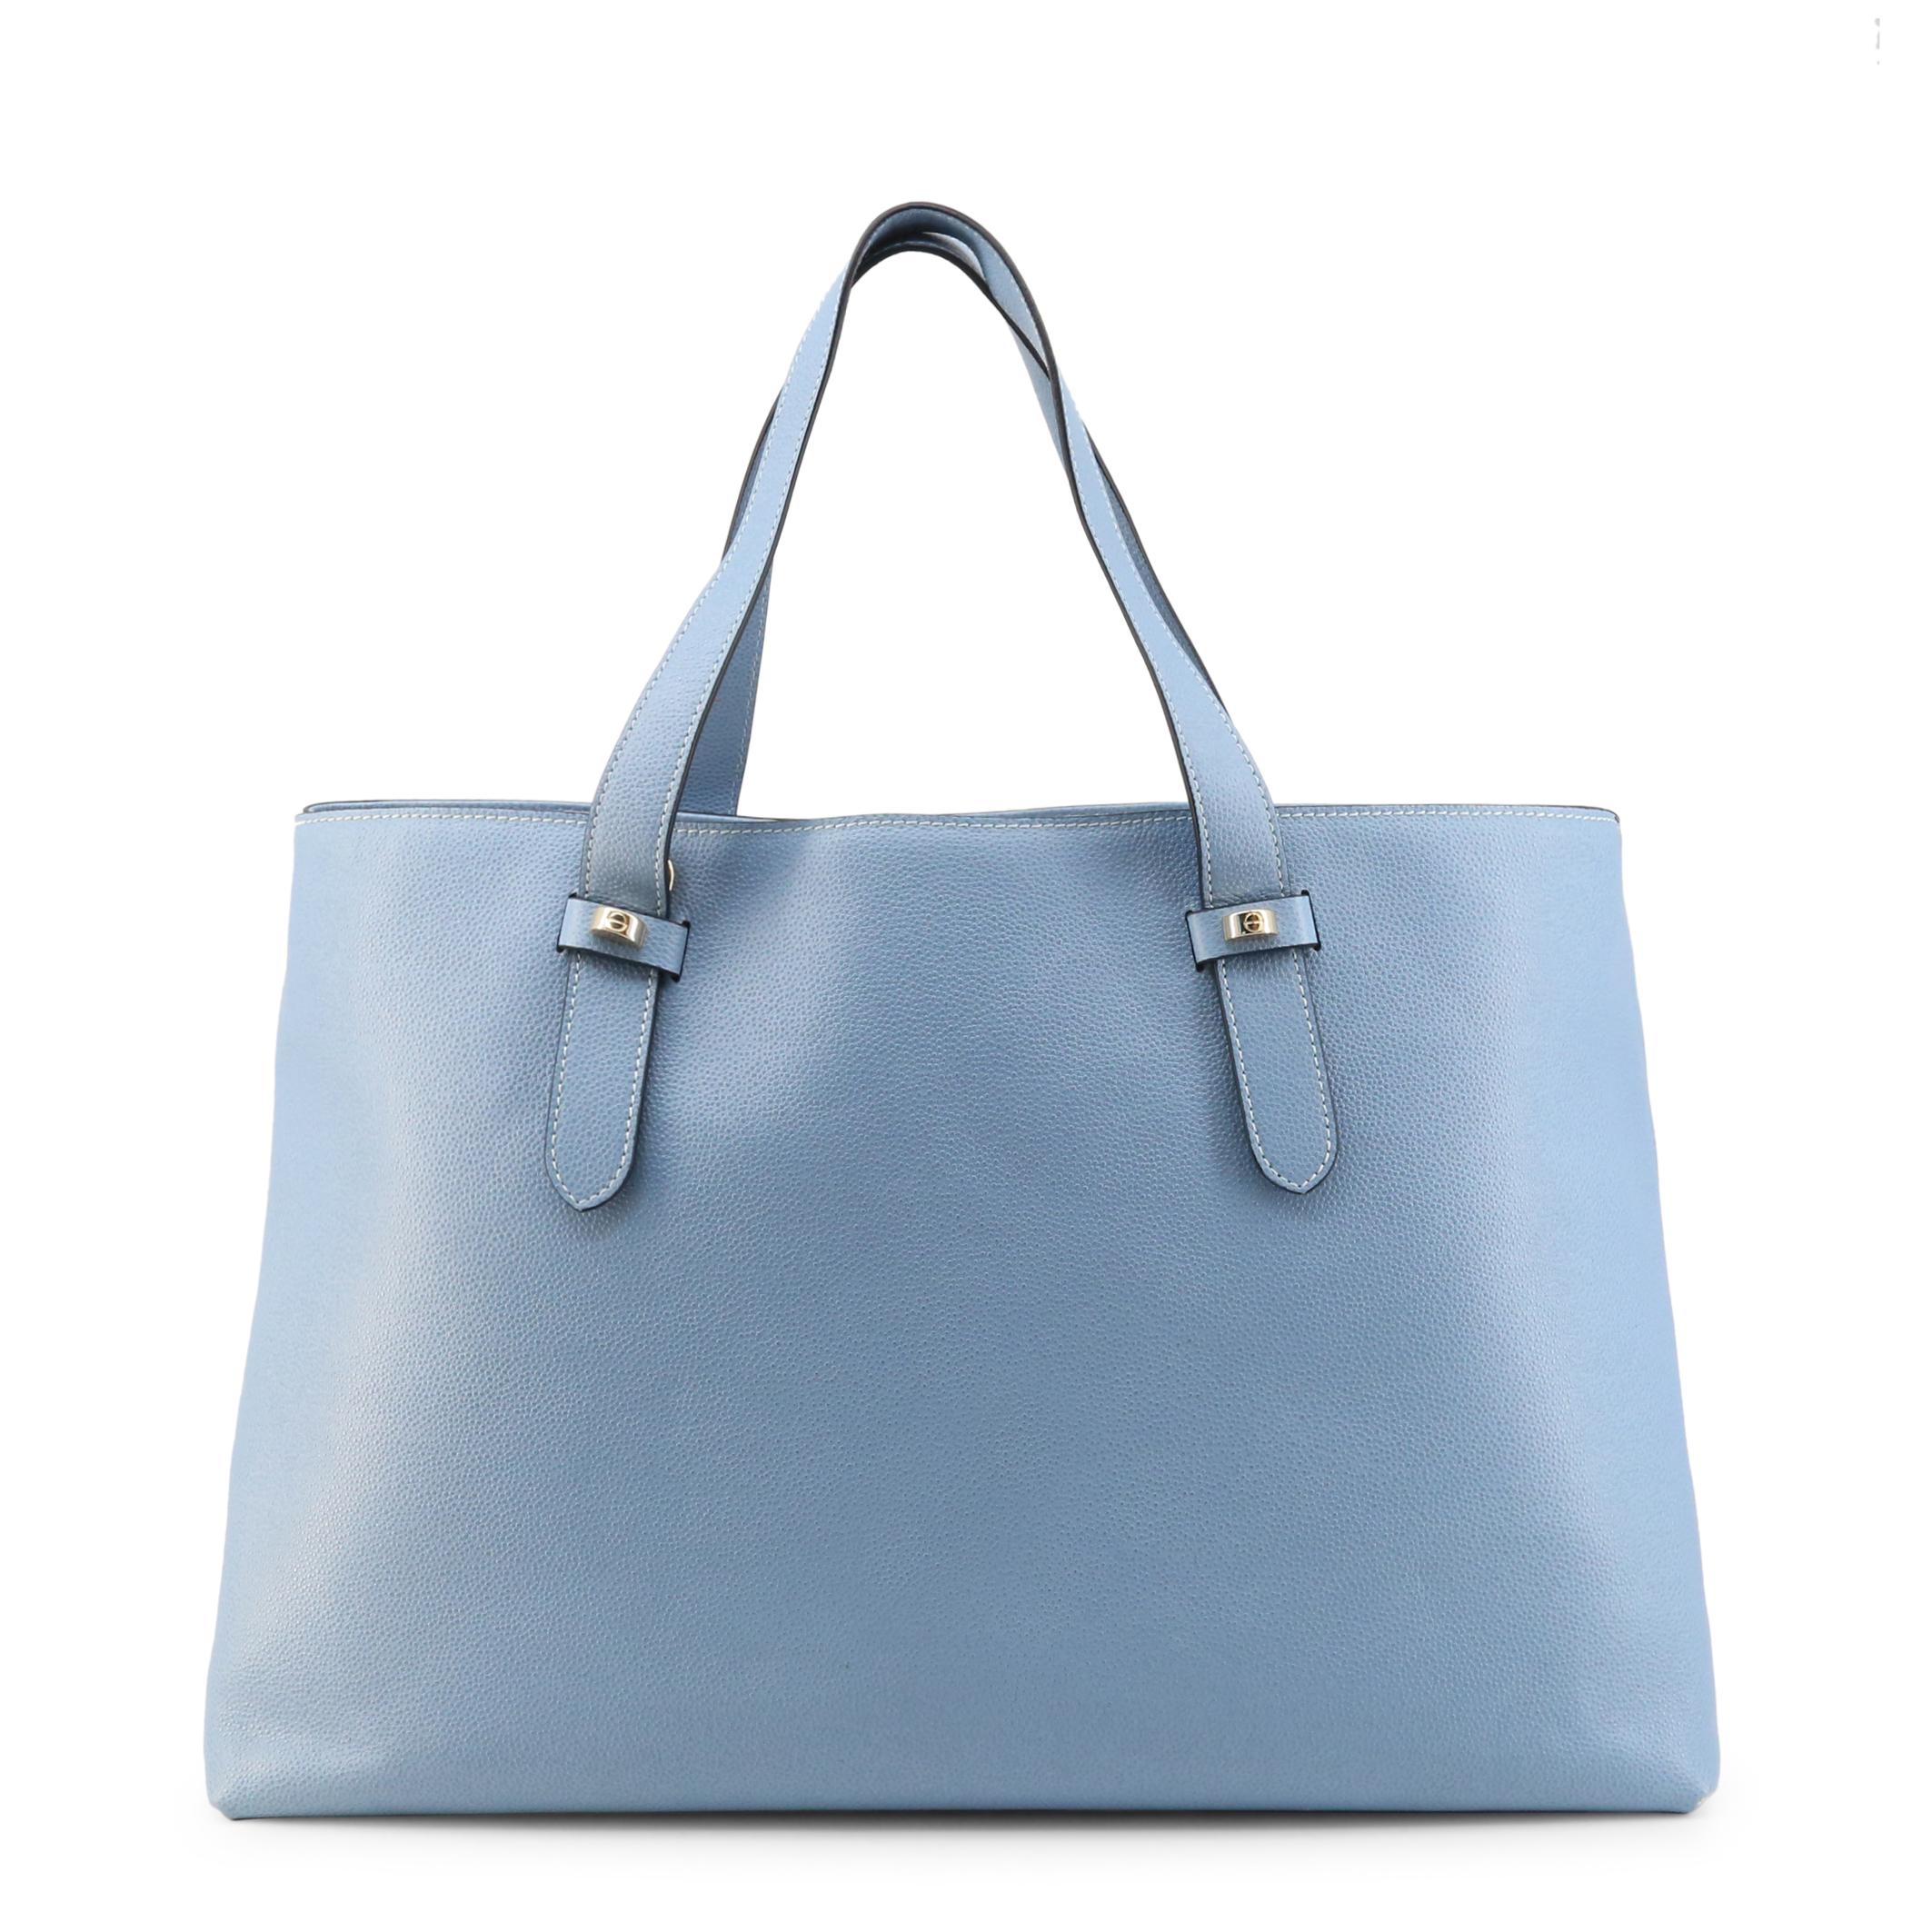 Borbonese - 923673-J04 - Blue